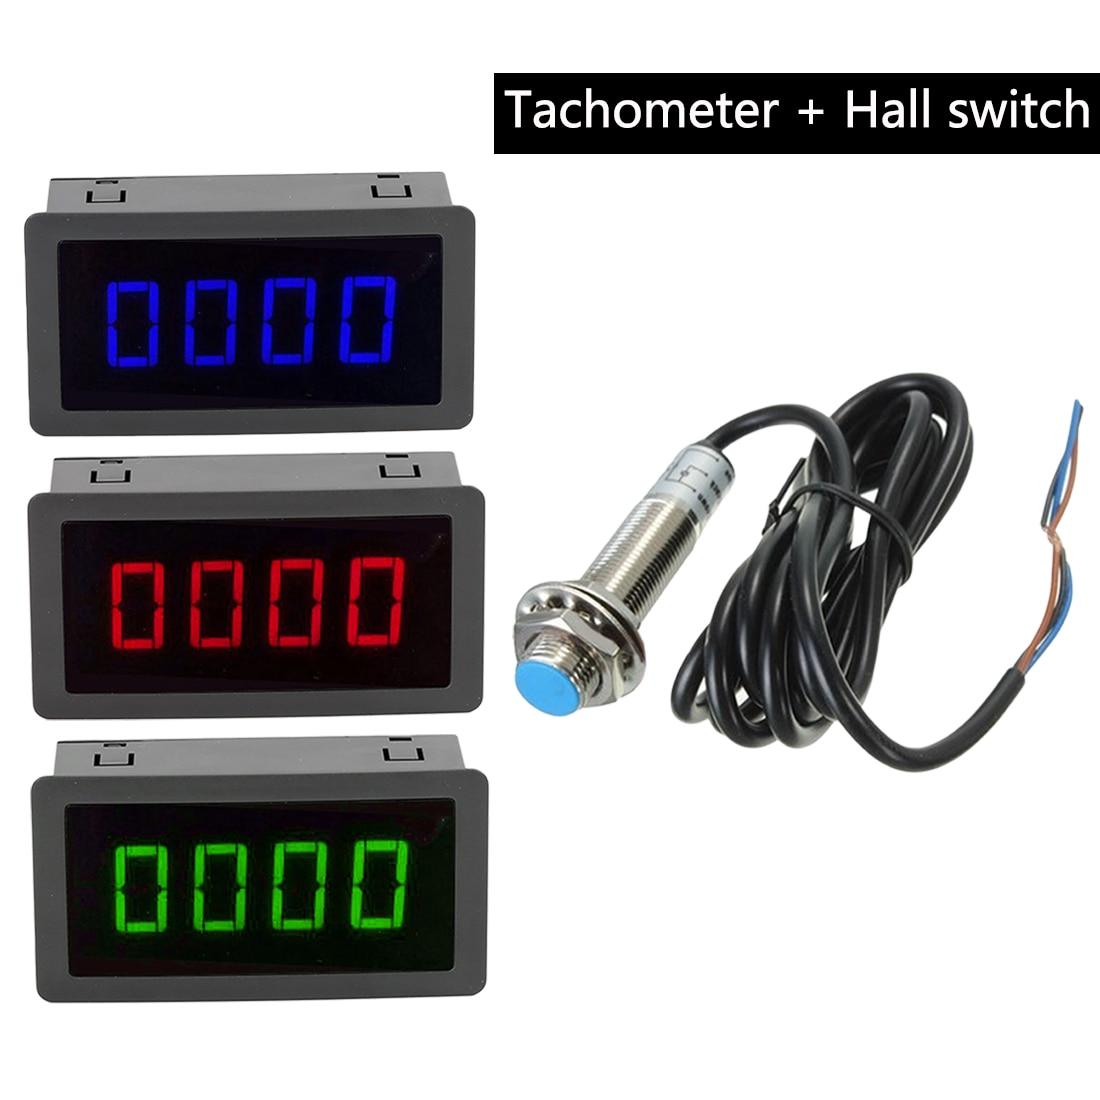 1Pc Measuring Gauges 4 Digital Blue/Green/Red LED Tachometer RPM Speed Meter 10-9999RPM Hall Proximity Switch Sensor NPN